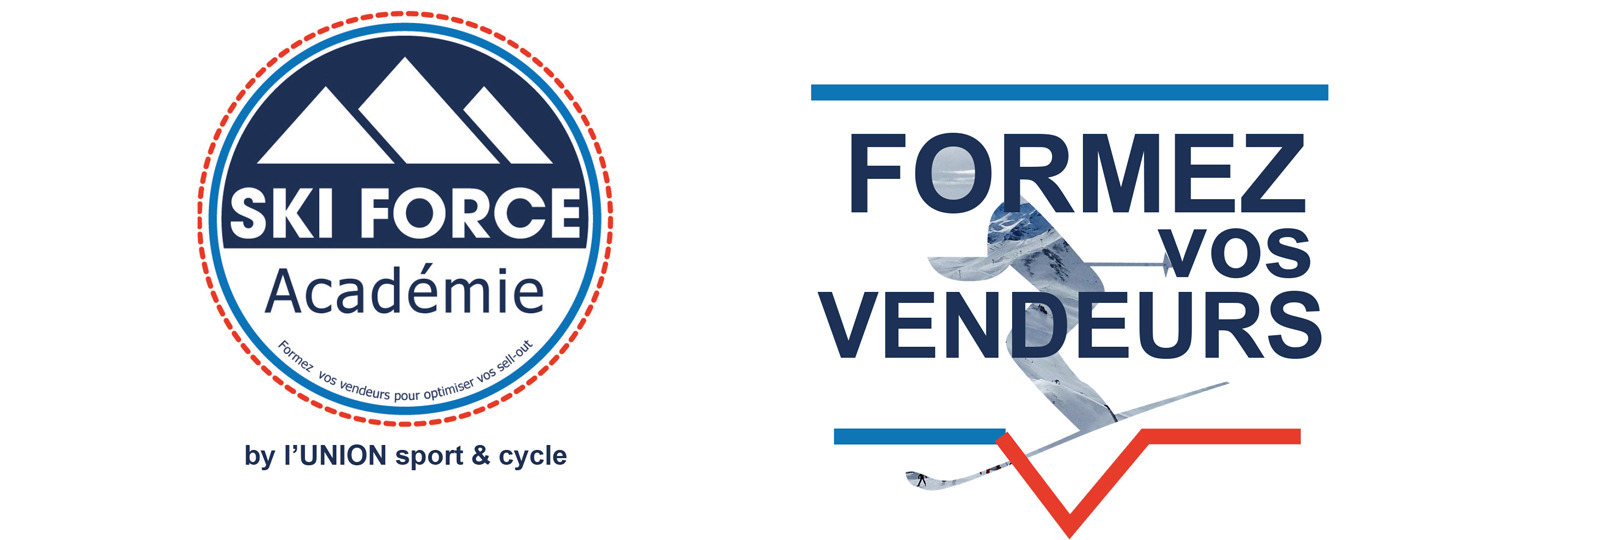 Le SKI FORCE lance La SKI FORCE Académie!